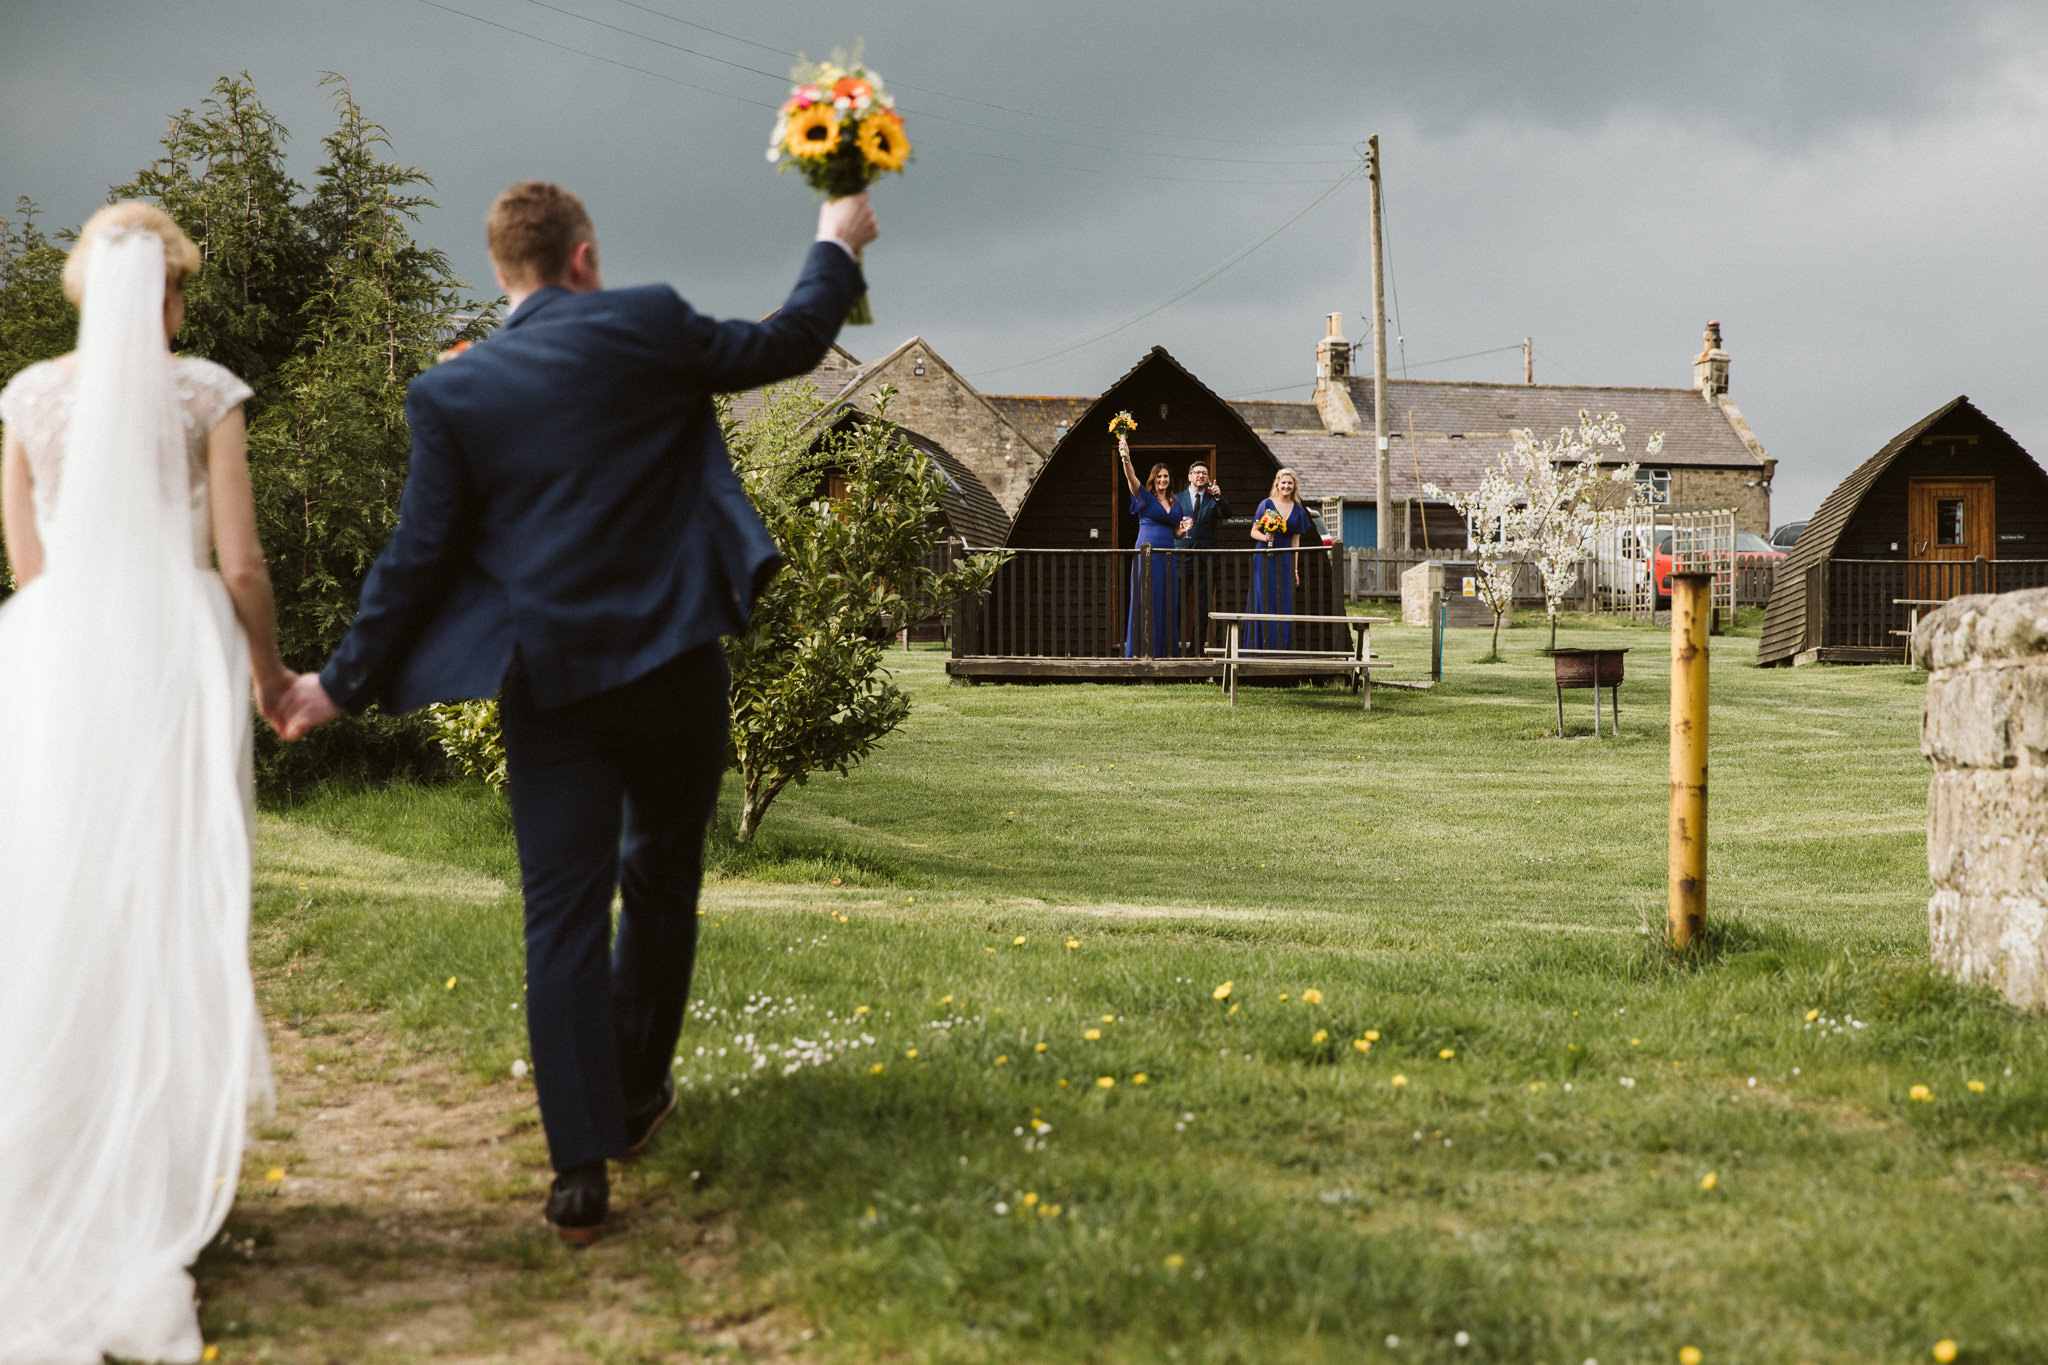 northside-farm-wedding-northumberland-margarita-hope (83).jpg